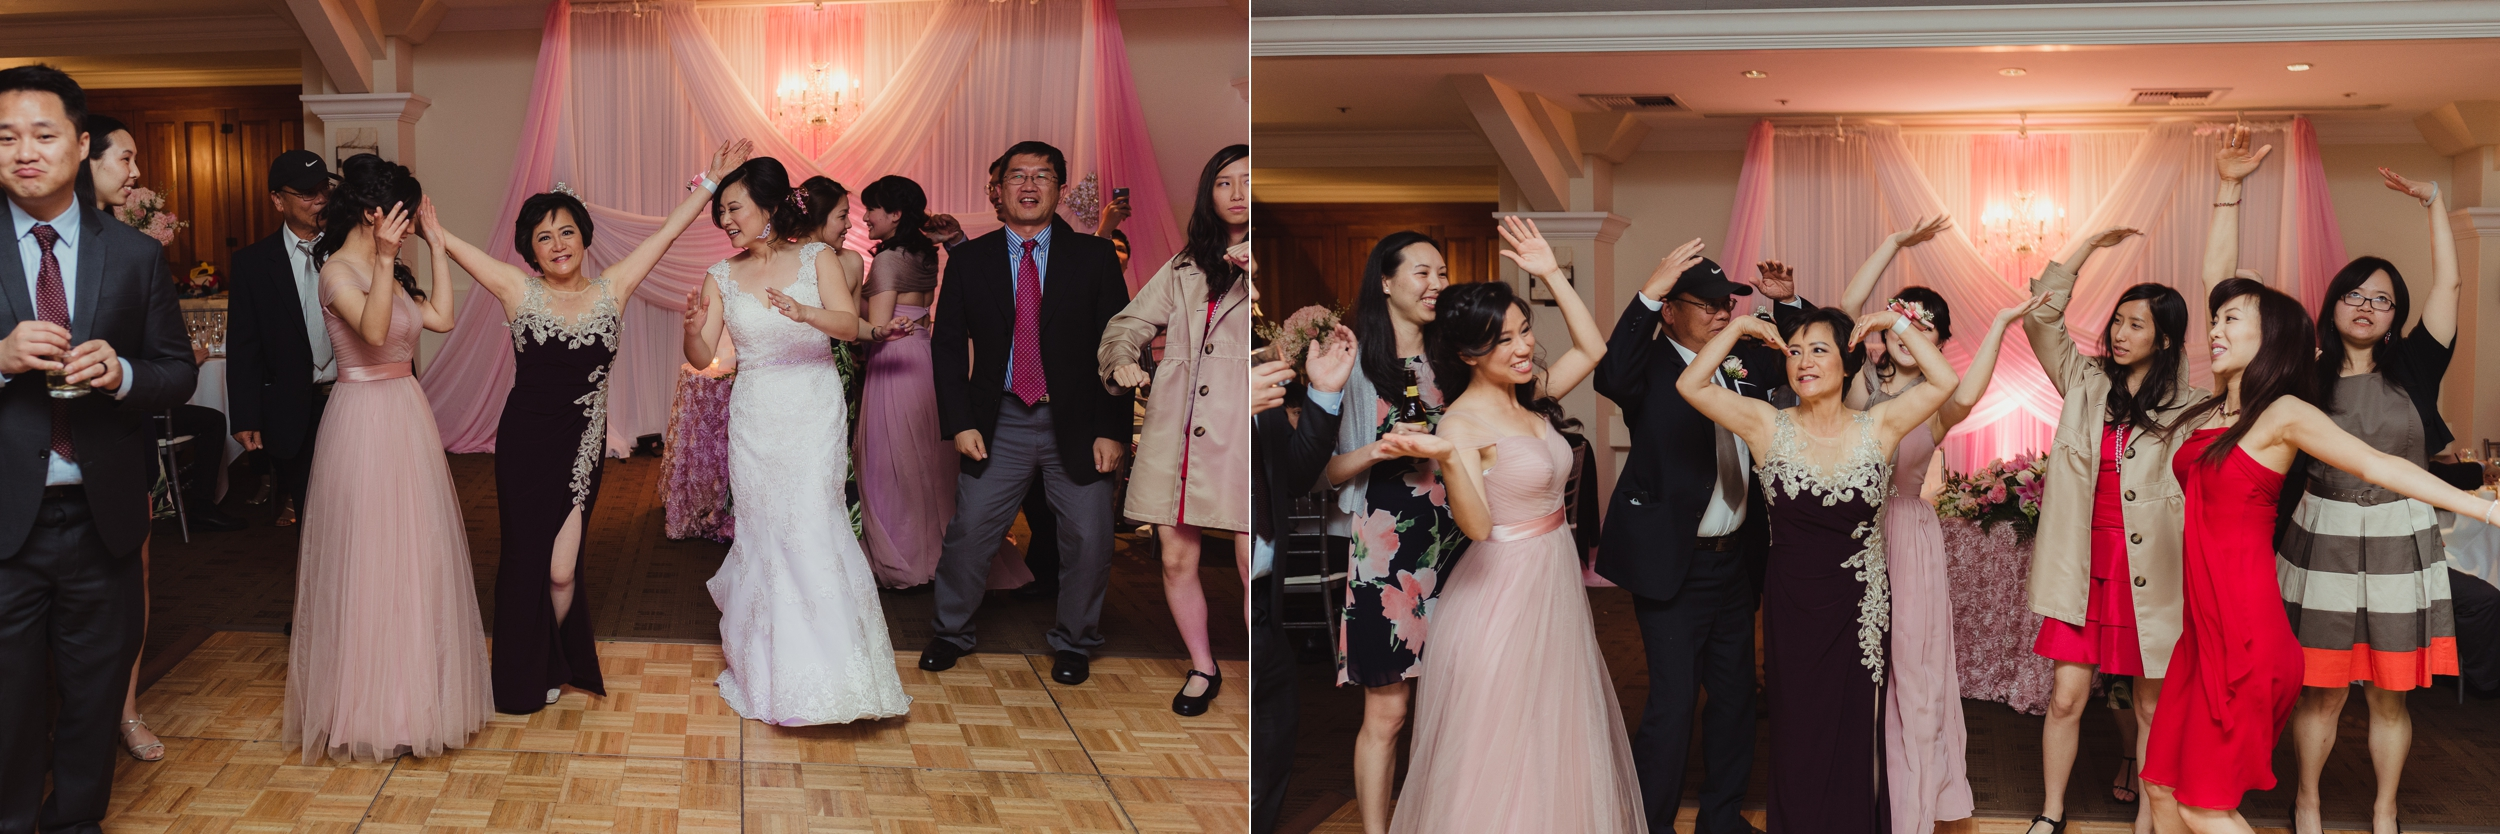 43-saratoga-country-club-wedding-vivianchen-777_WEB.jpg